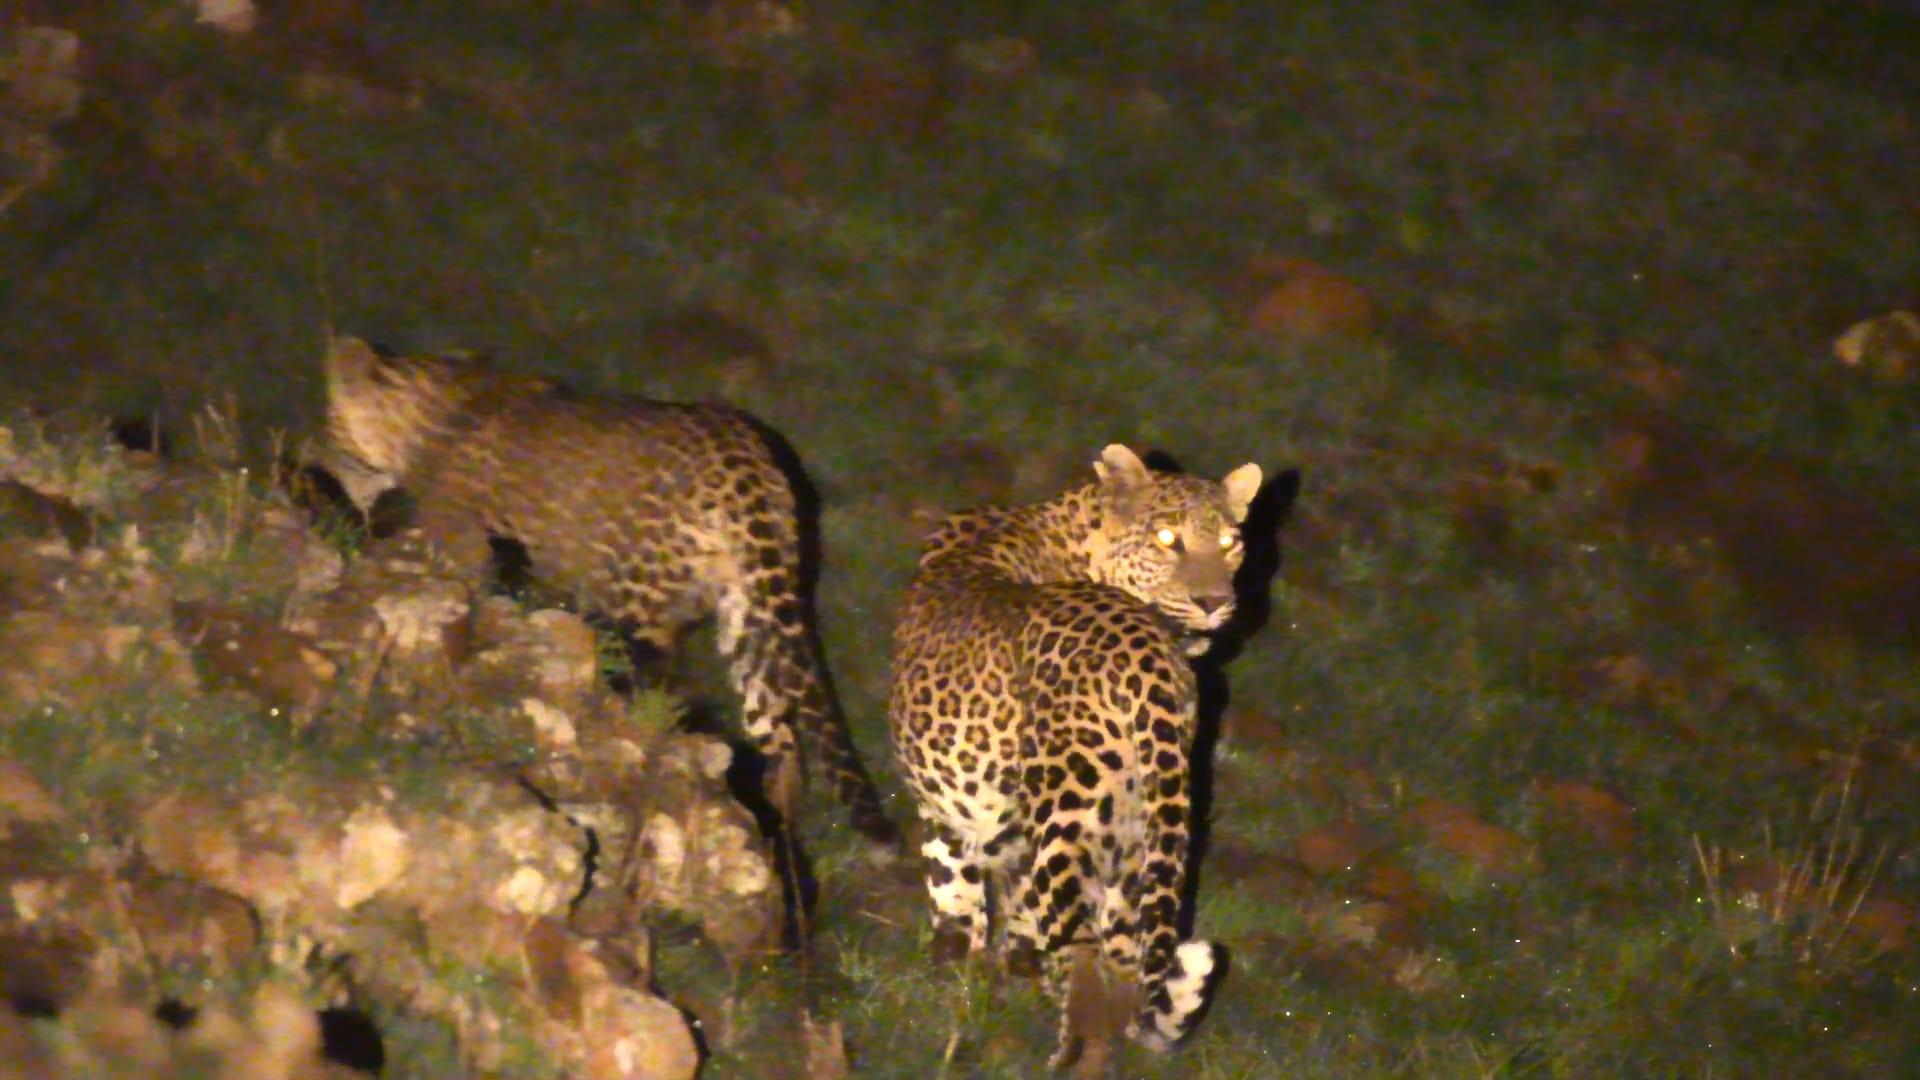 Leopards of Saswad: On the Edge of a Concrete Jungle